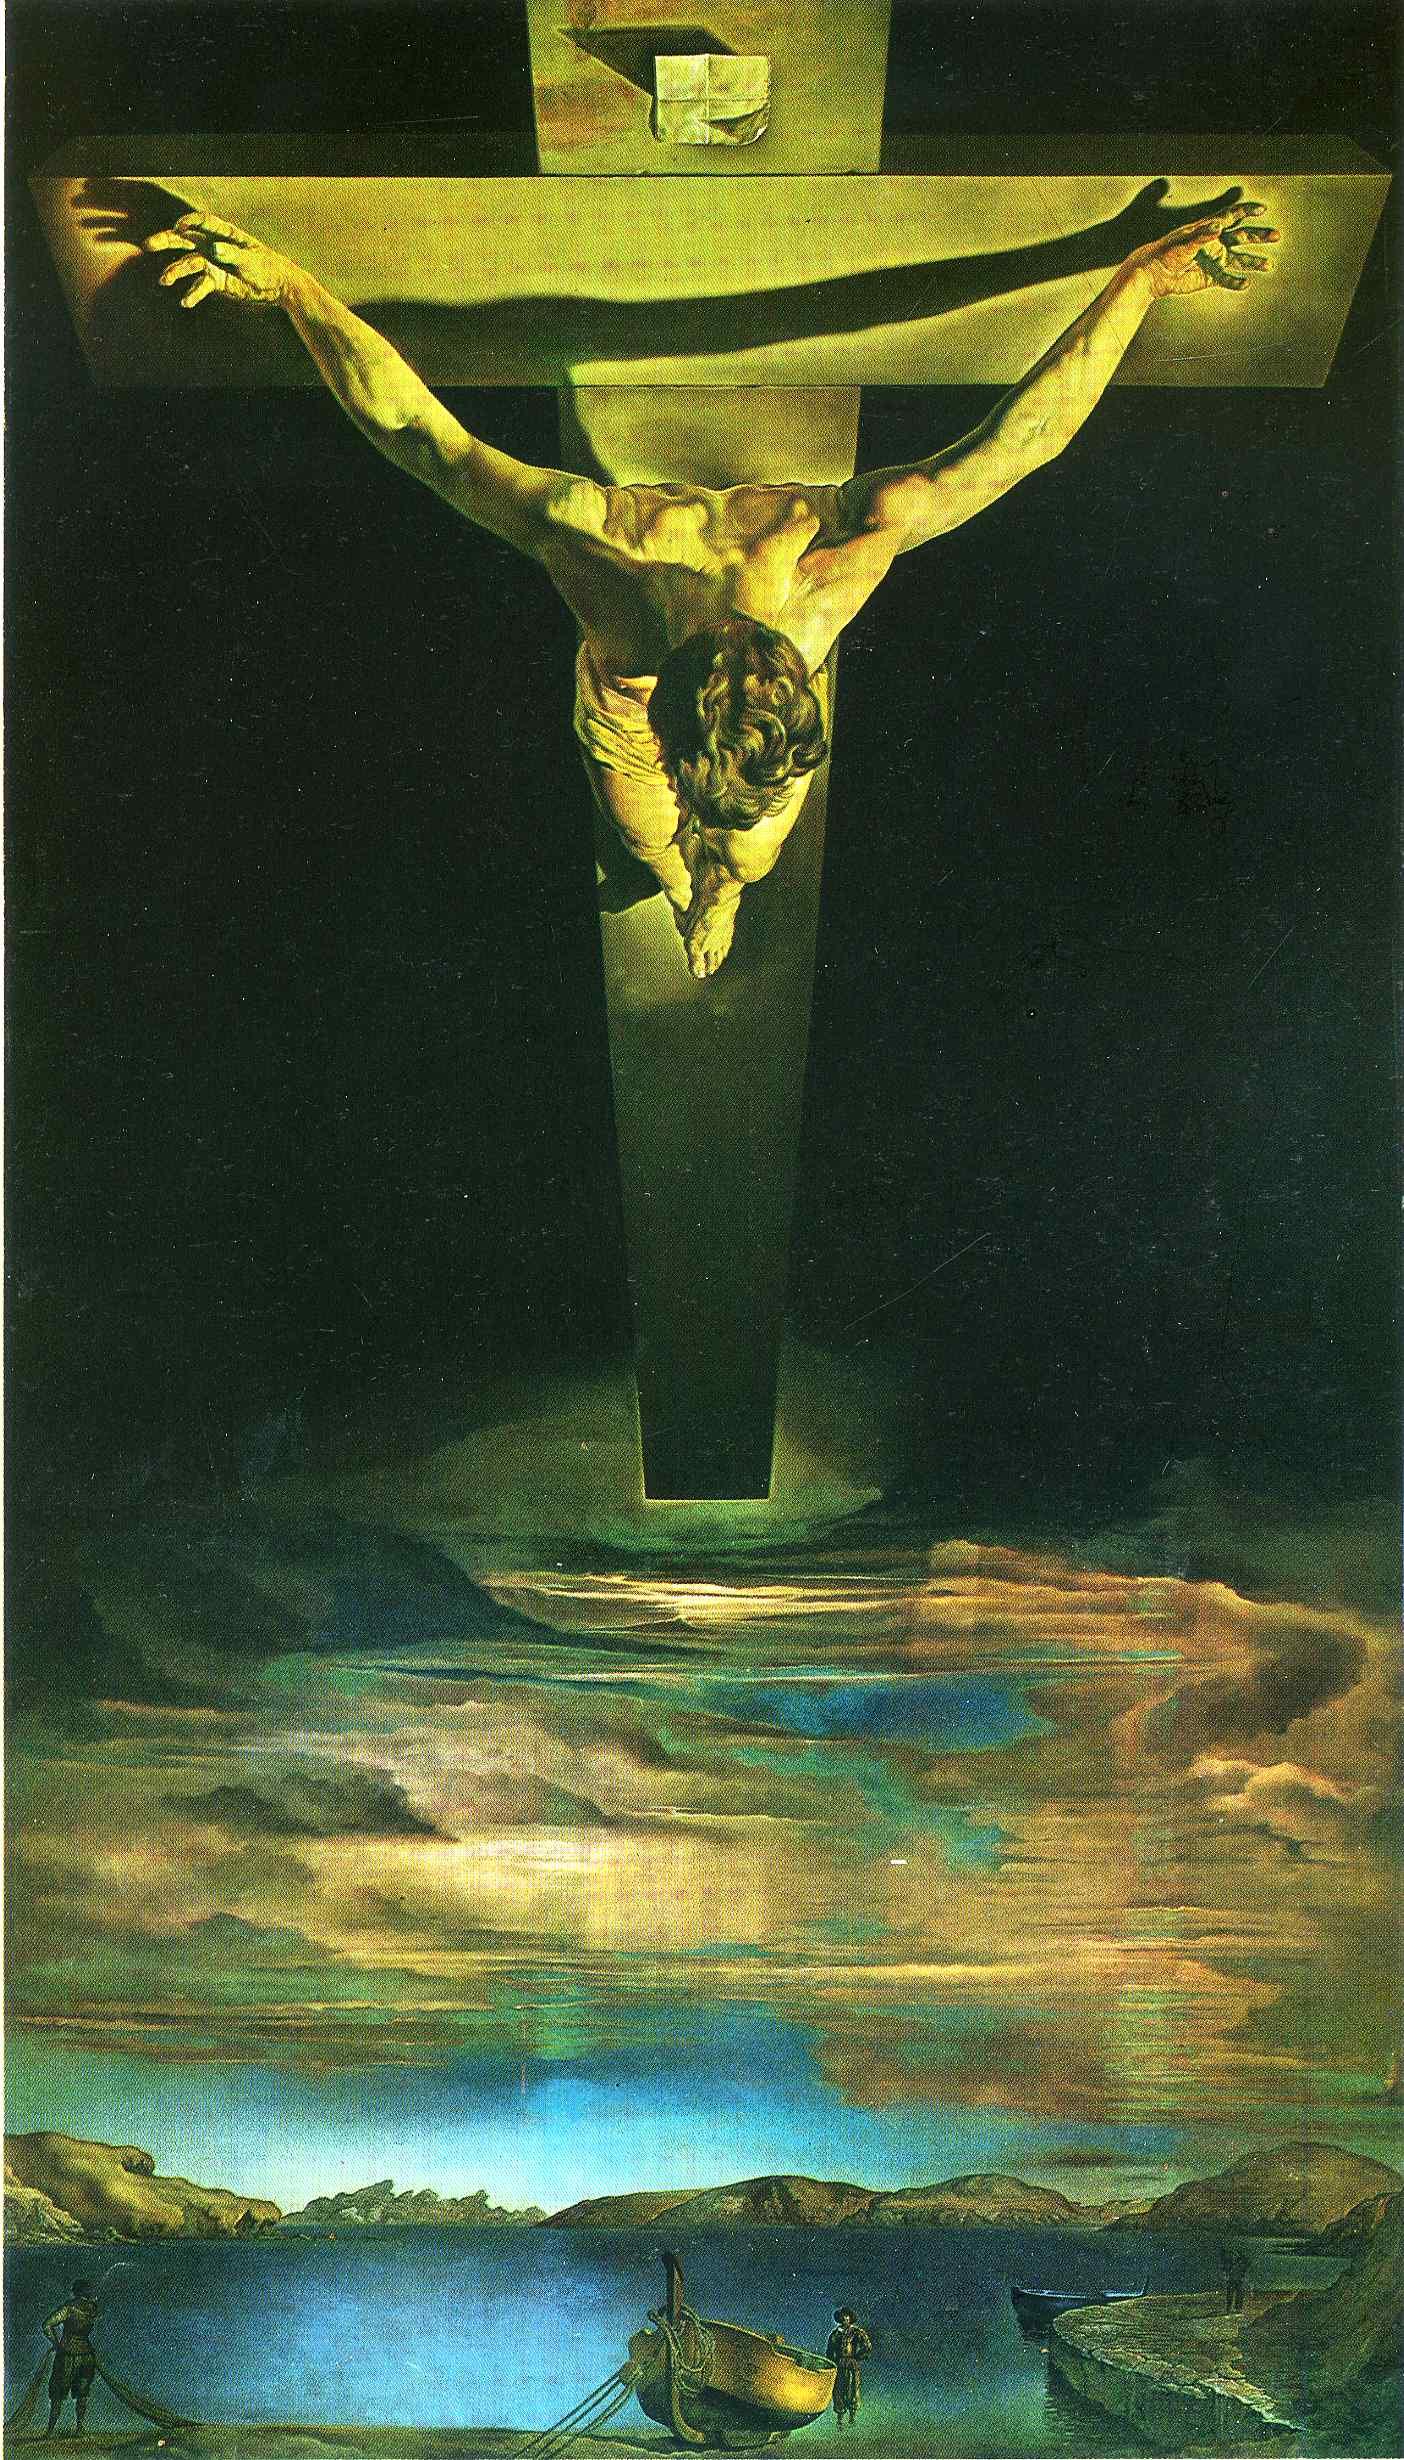 https://elniplex.files.wordpress.com/2013/04/christ-of-saint-john-of-the-cross-s-dali-1951.jpg